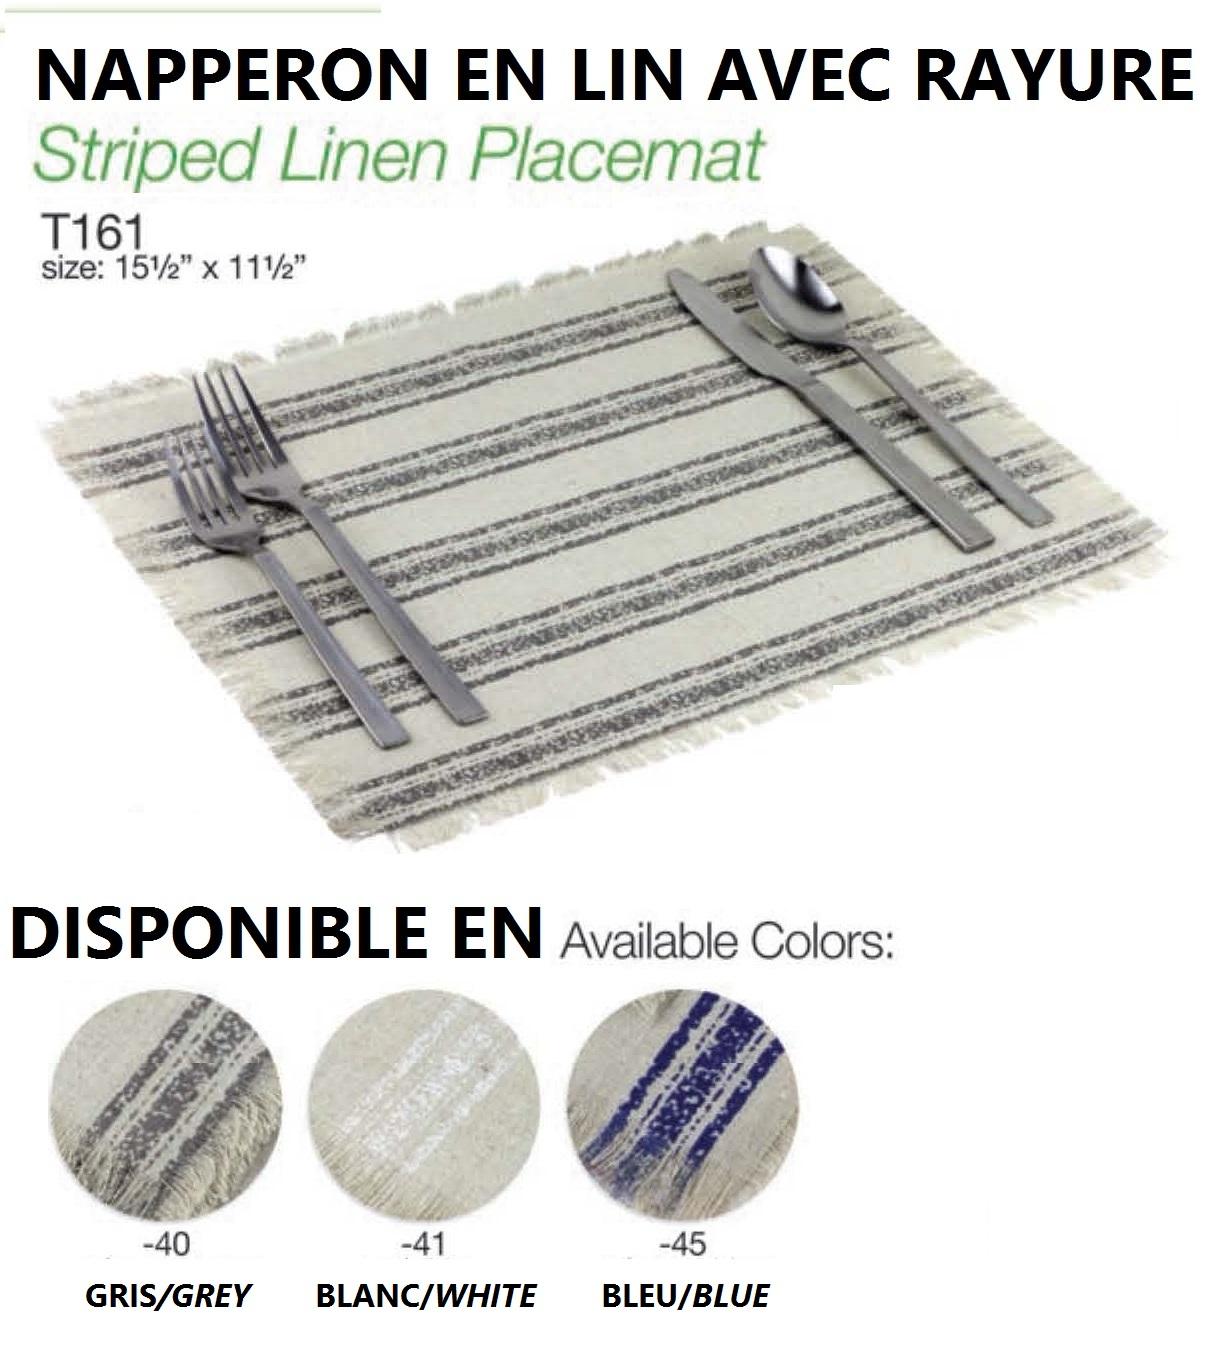 15 5 X 11 5 Striped Linen Placemat